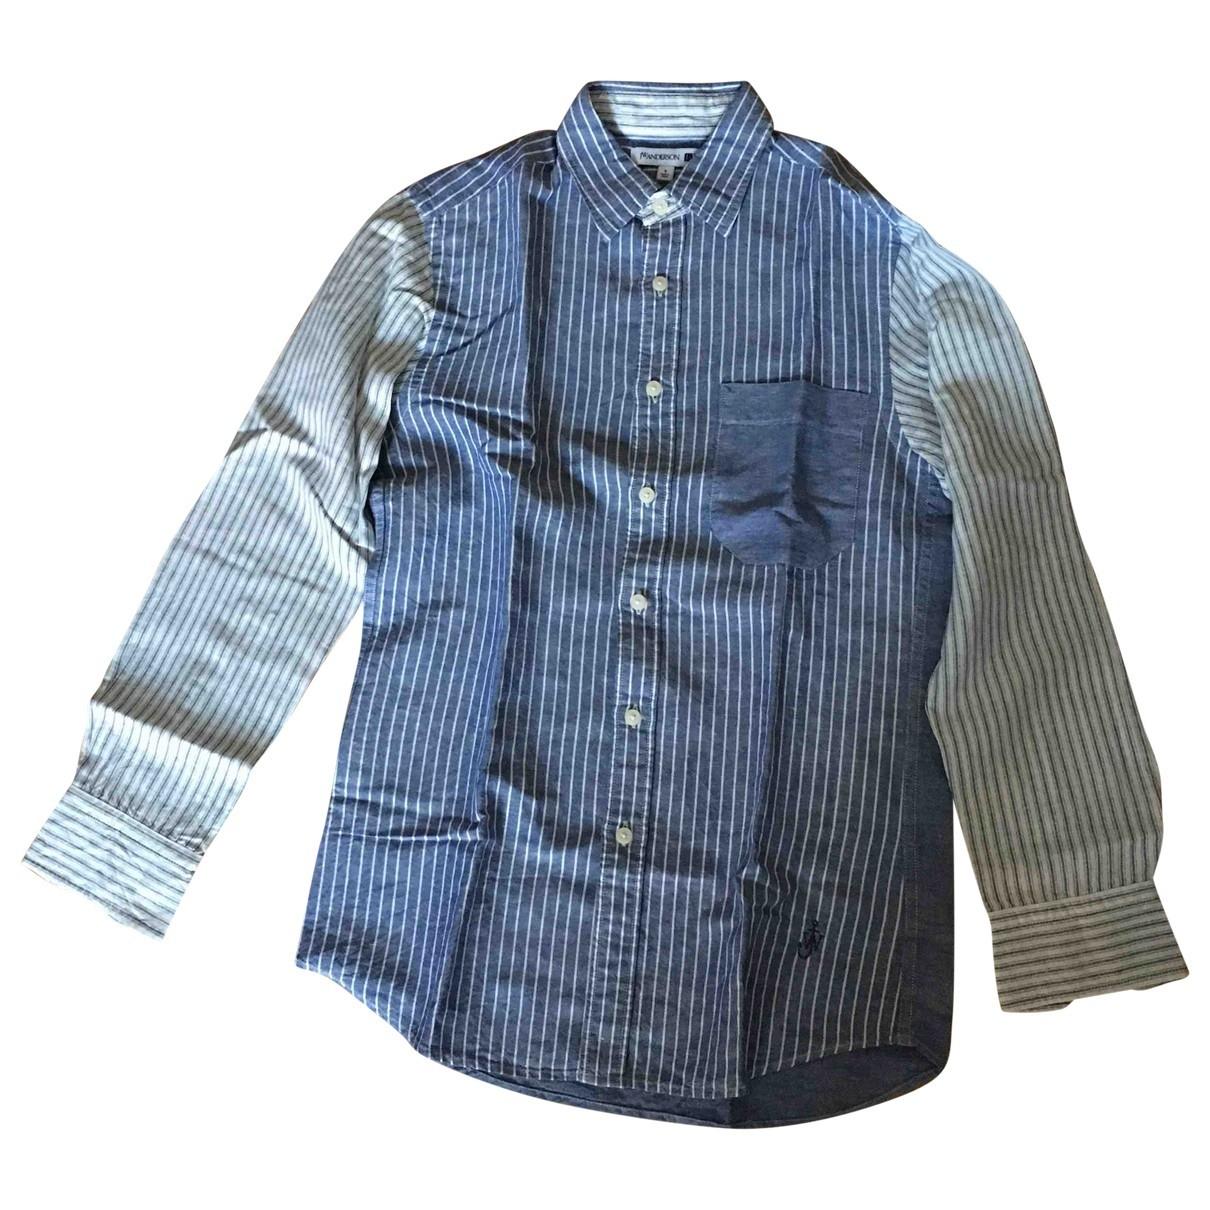 Uniqlo \N Blue Linen Shirts for Men S International